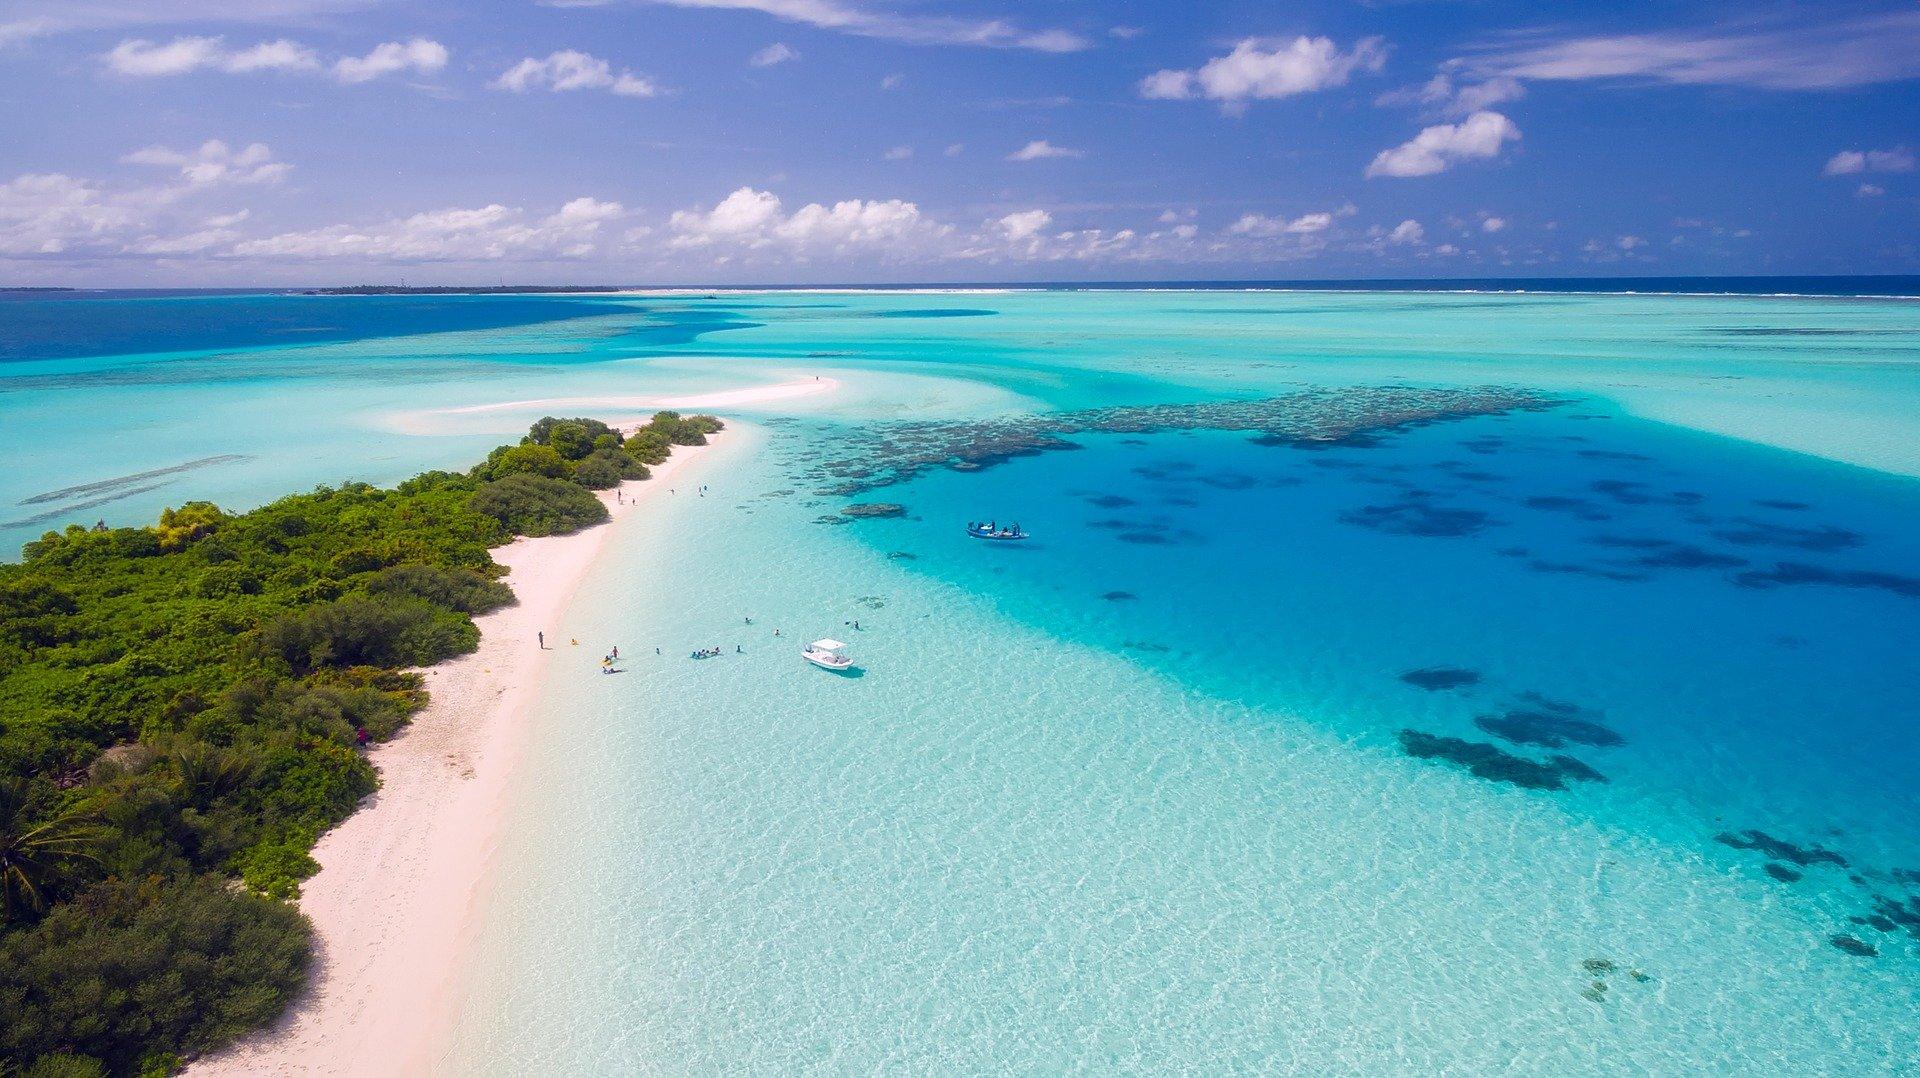 maldive tour virtuale